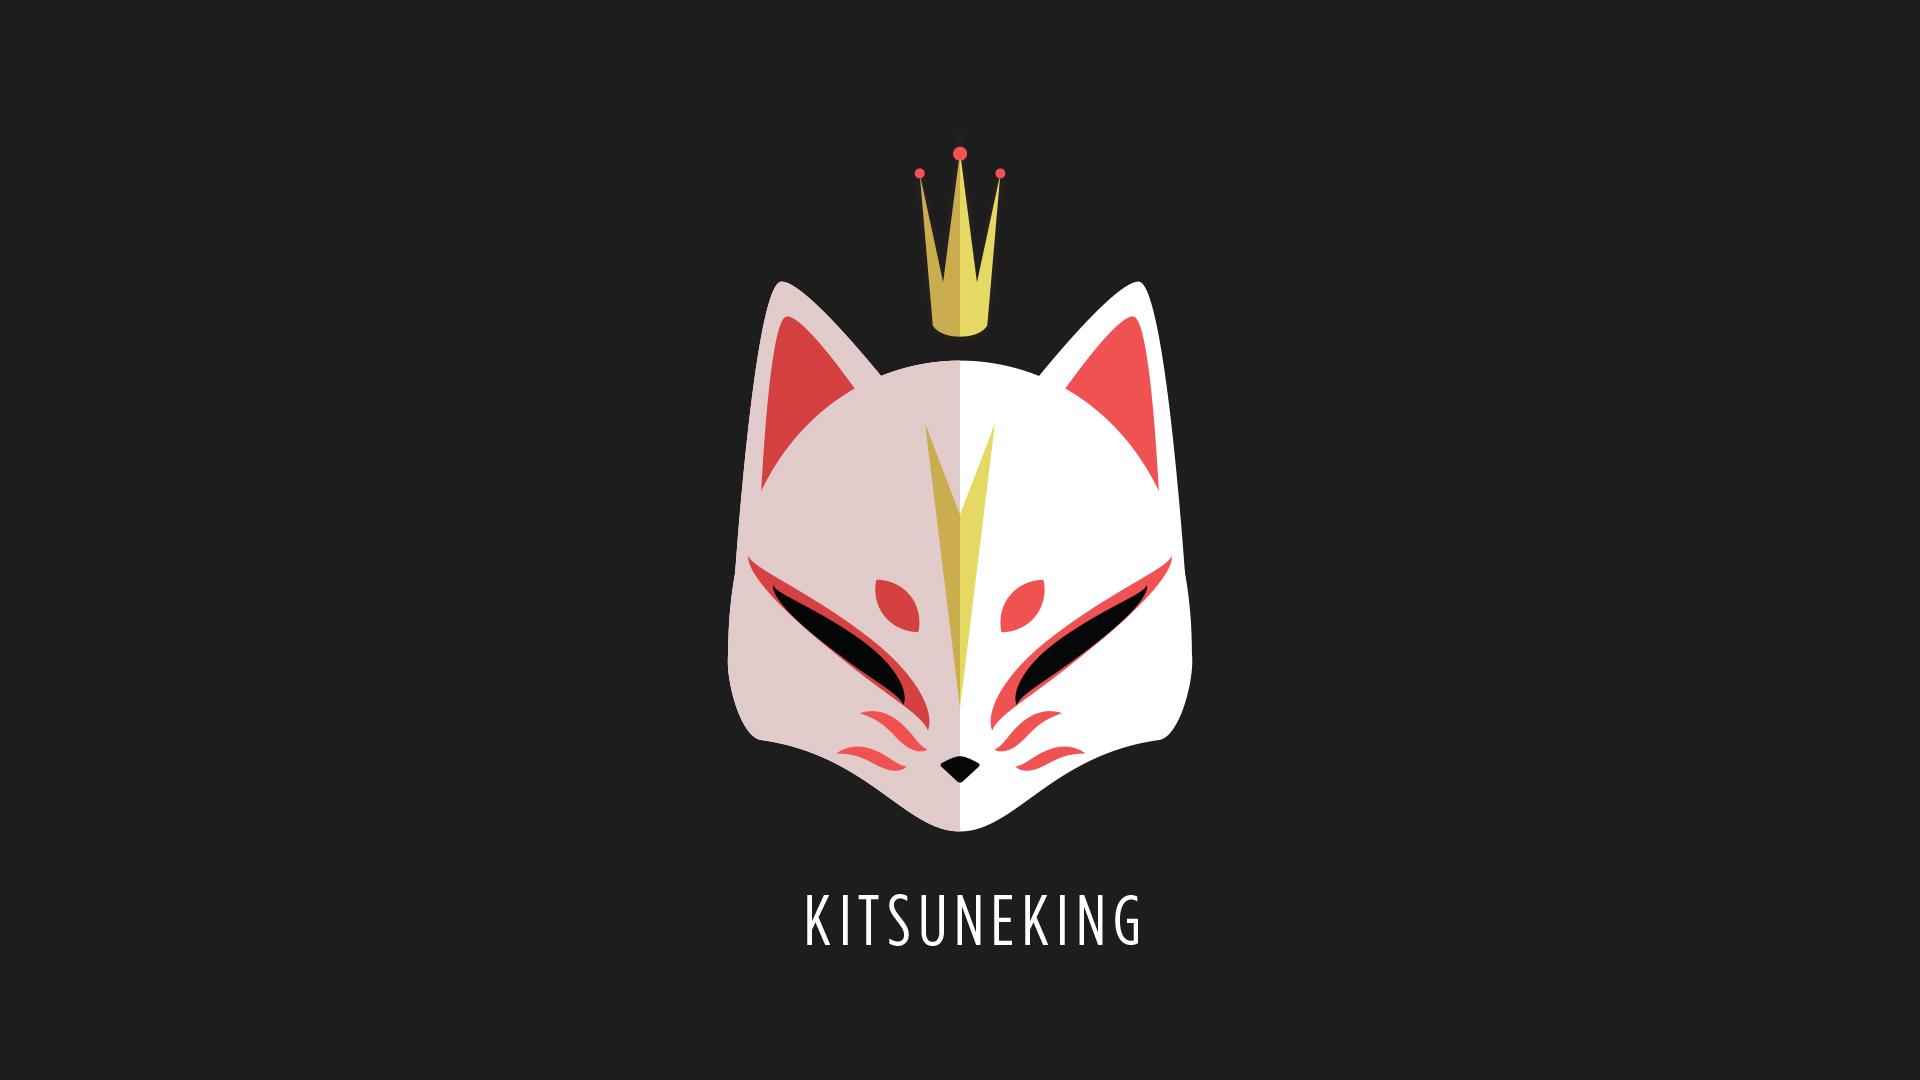 port_kitsuneking_logo.jpg